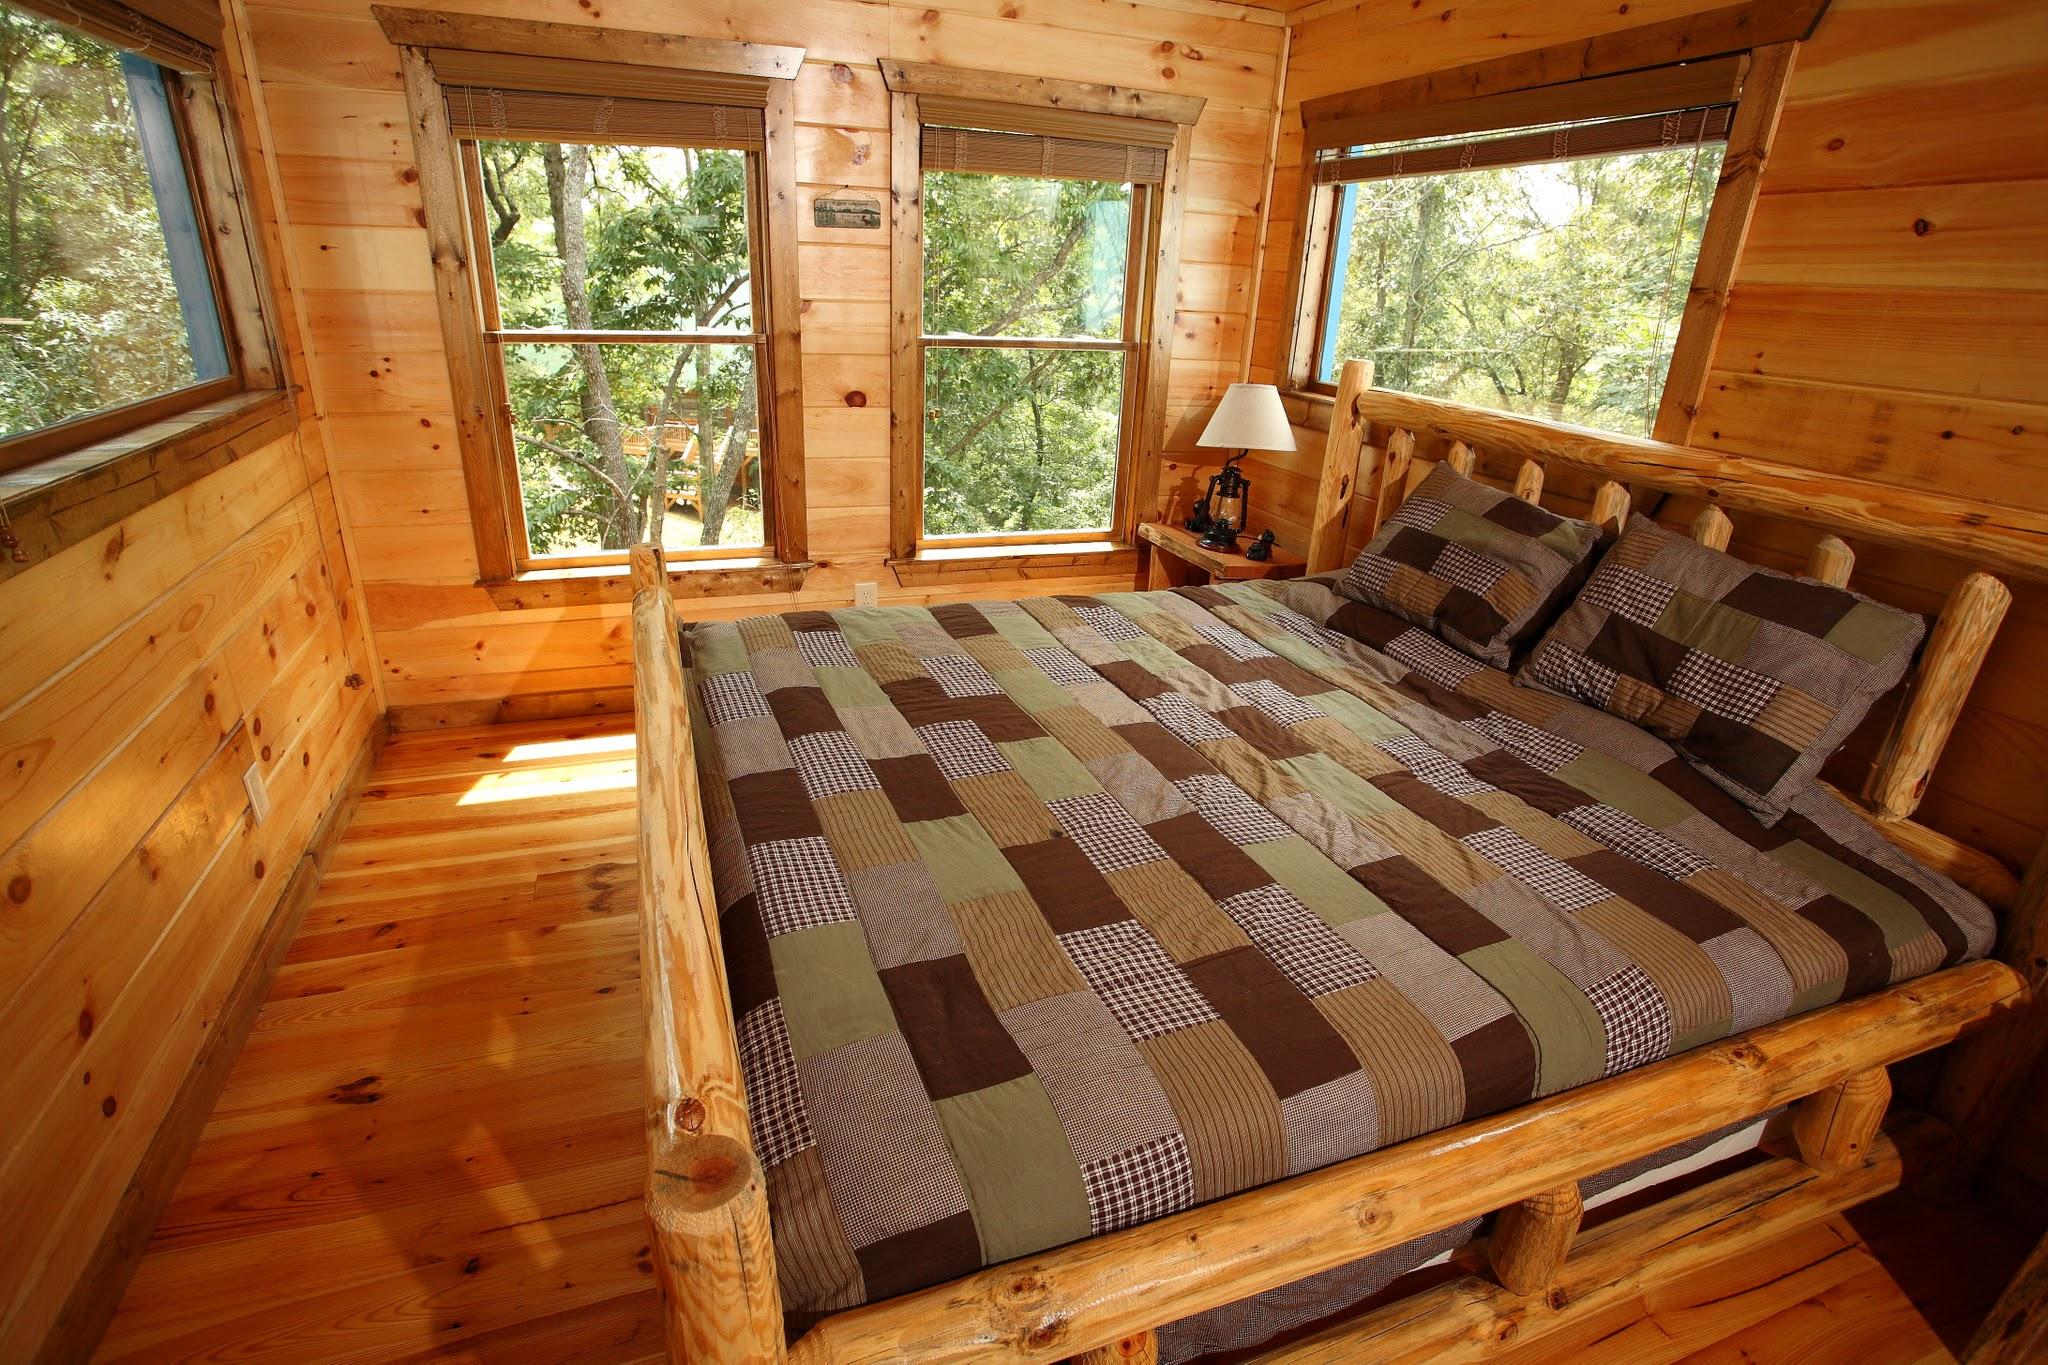 Bear Hollow Helen Ga Cabin Rentals Cedar Creek Cabin Rentals Luxury Cabins